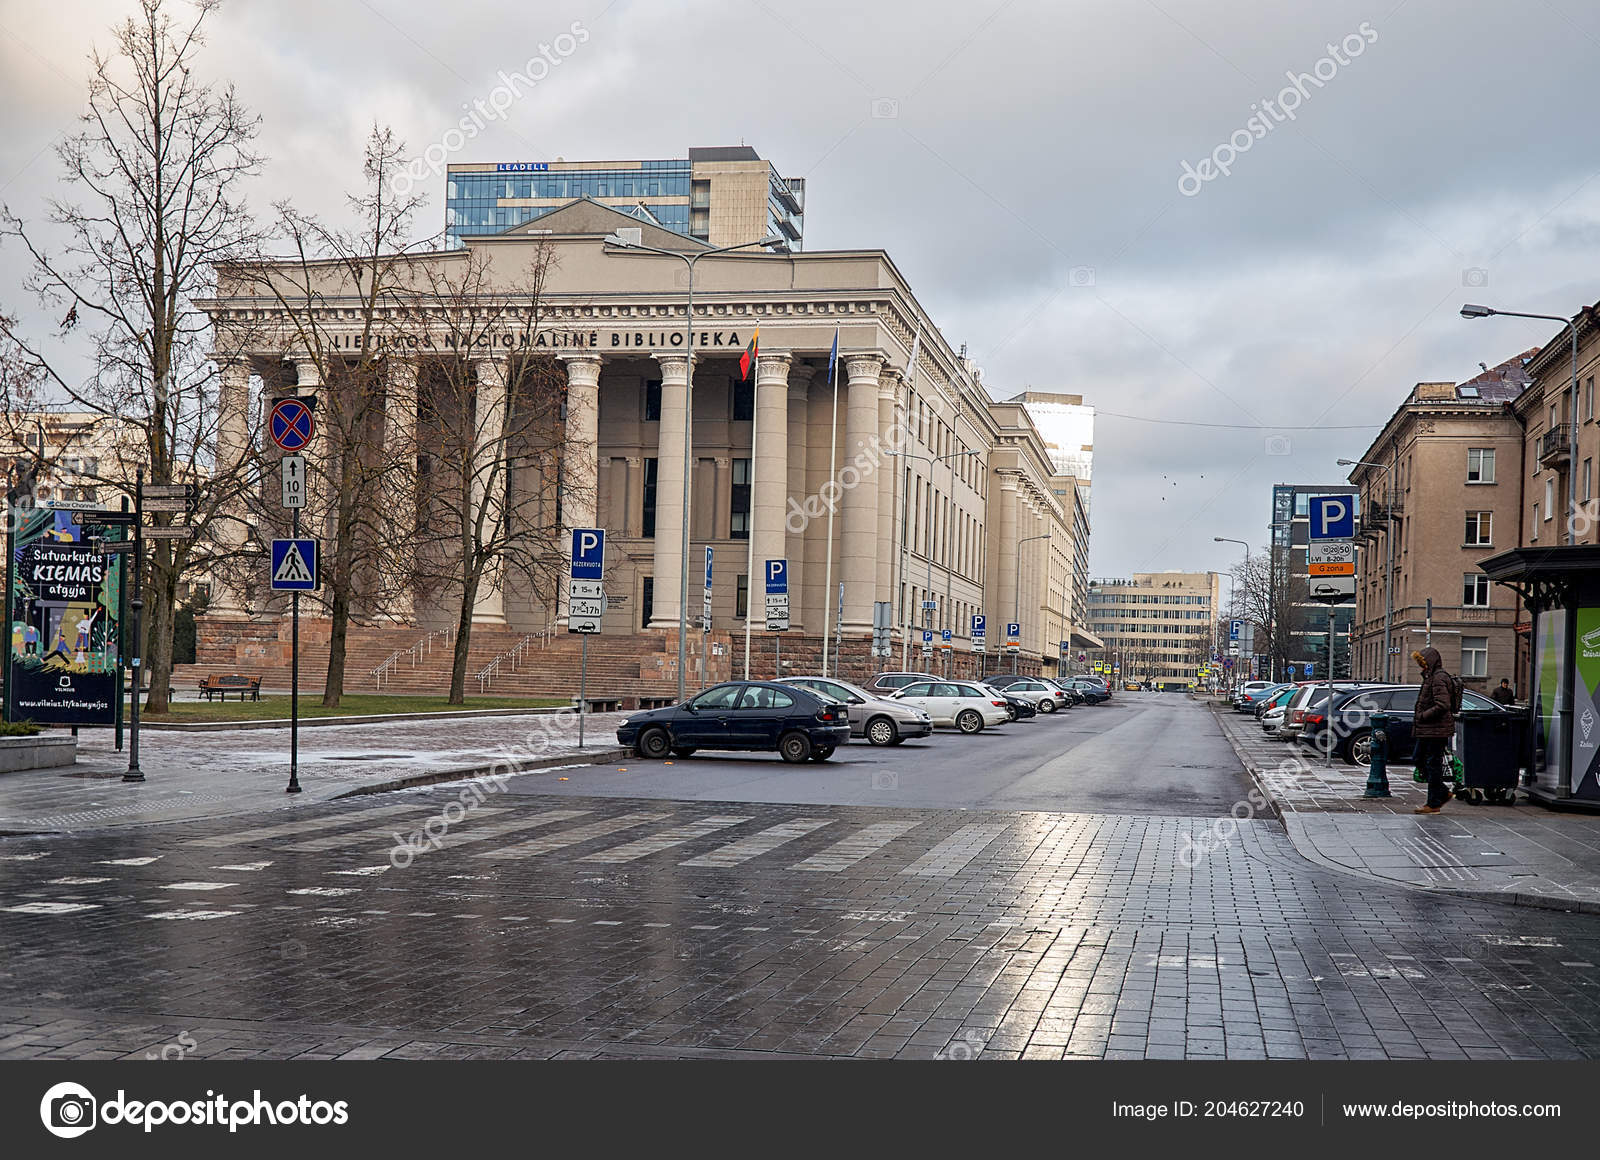 d493b808f90 Λιθουανία Βίλνιους Κτίριο Της Εθνικής Βιβλιοθήκης Στο Βίλνιους Λιθουανίας  Δεκεμβρίου — Φωτογραφία Αρχείου